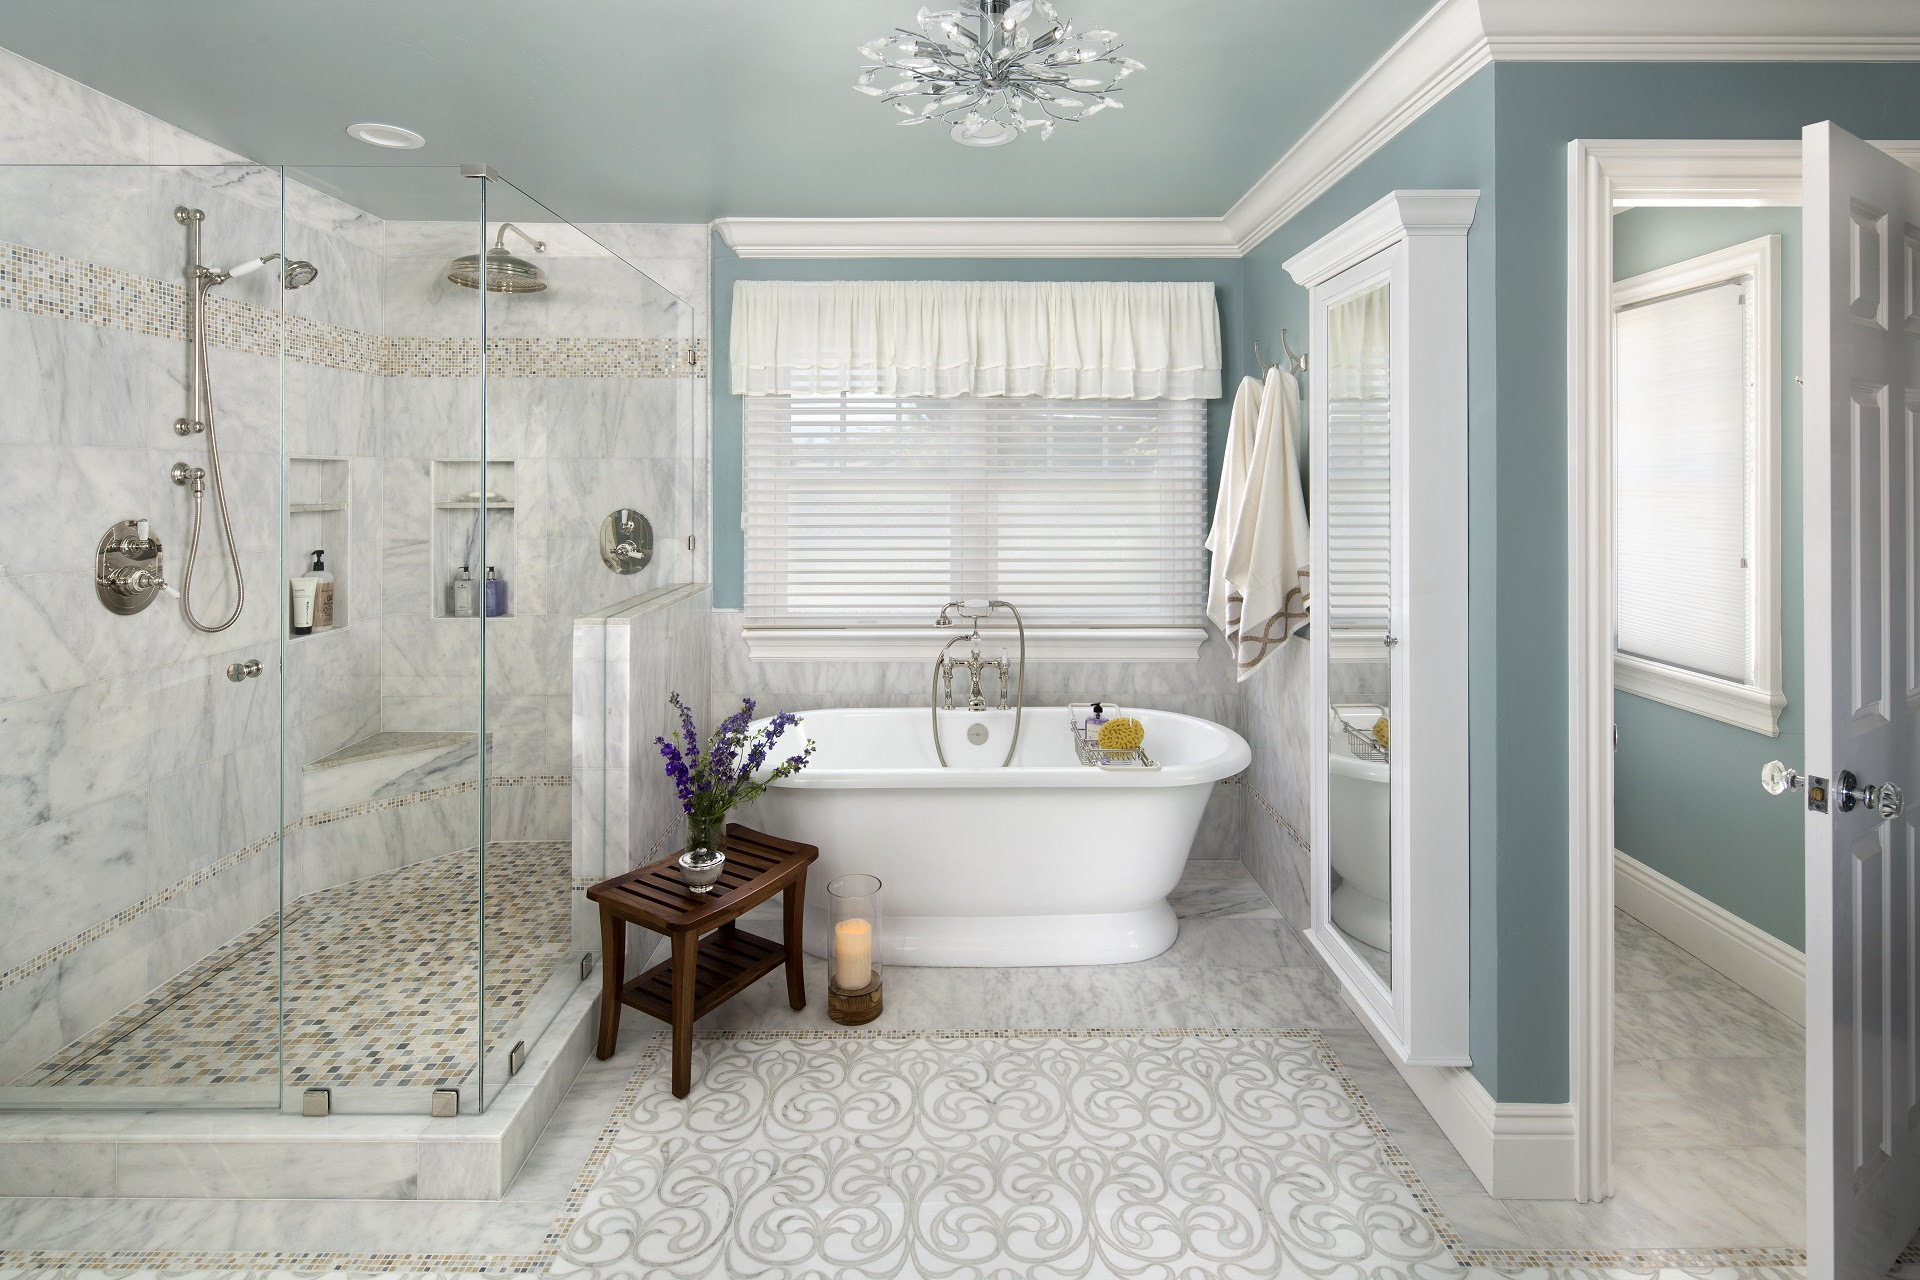 Bathroom Remodeling Portfolio - Valley Home Builders